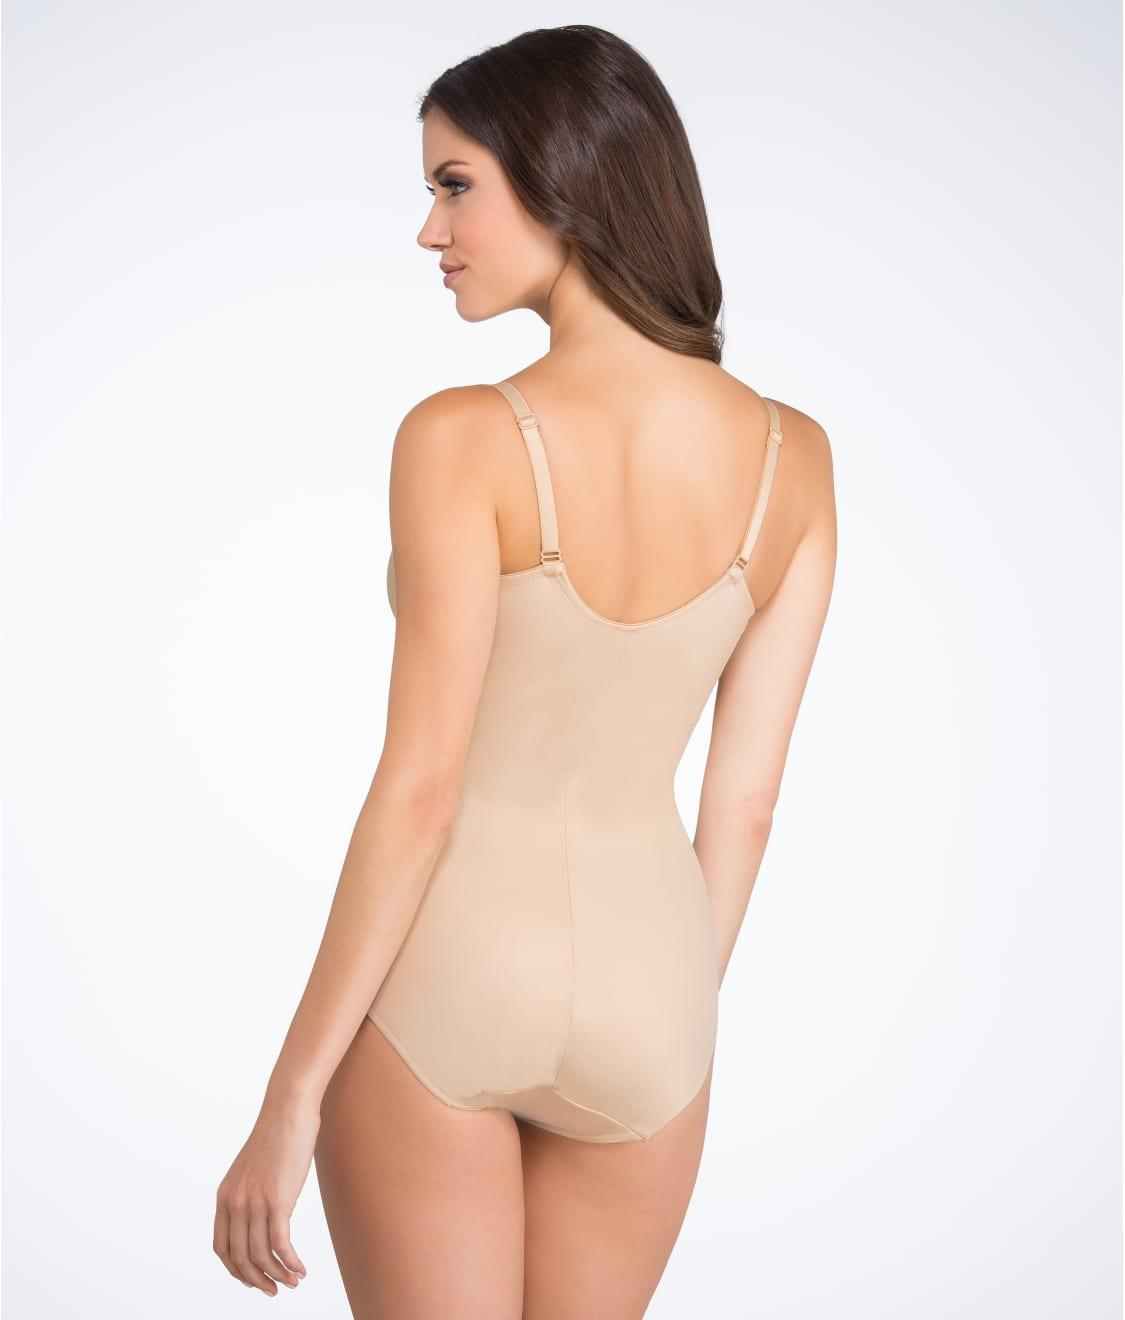 1cc159e5a6 Miraclesuit Extra Firm Control Comfort Leg Bodysuit